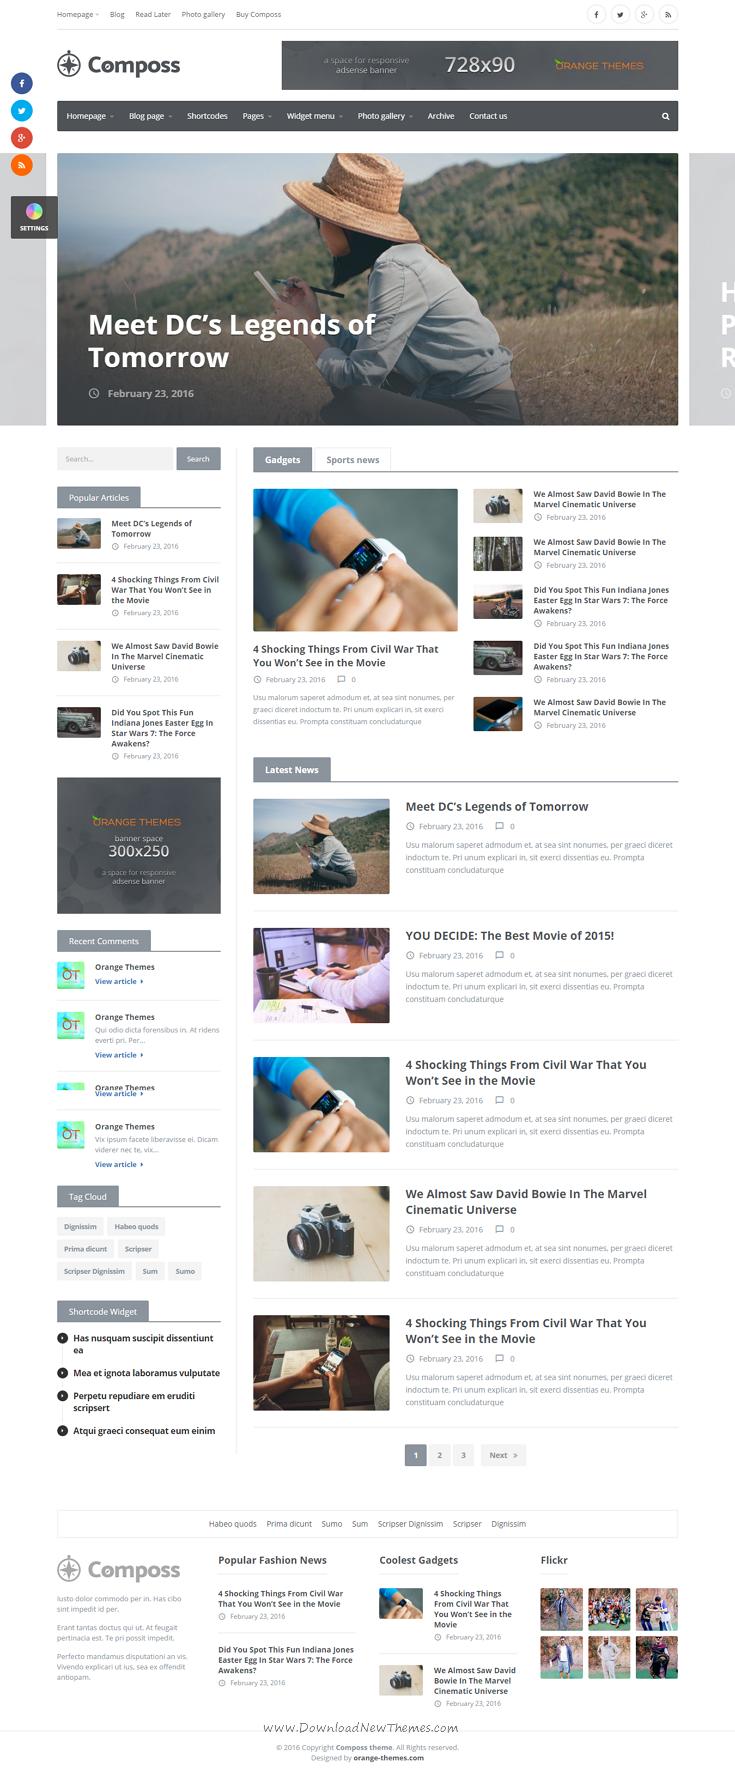 Composs Elegant Wordpress Theme For Blog Magazine And News Website Newspaper Wordpress Ecommer In 2020 News Website Design News Web Design Elegant Wordpress Themes